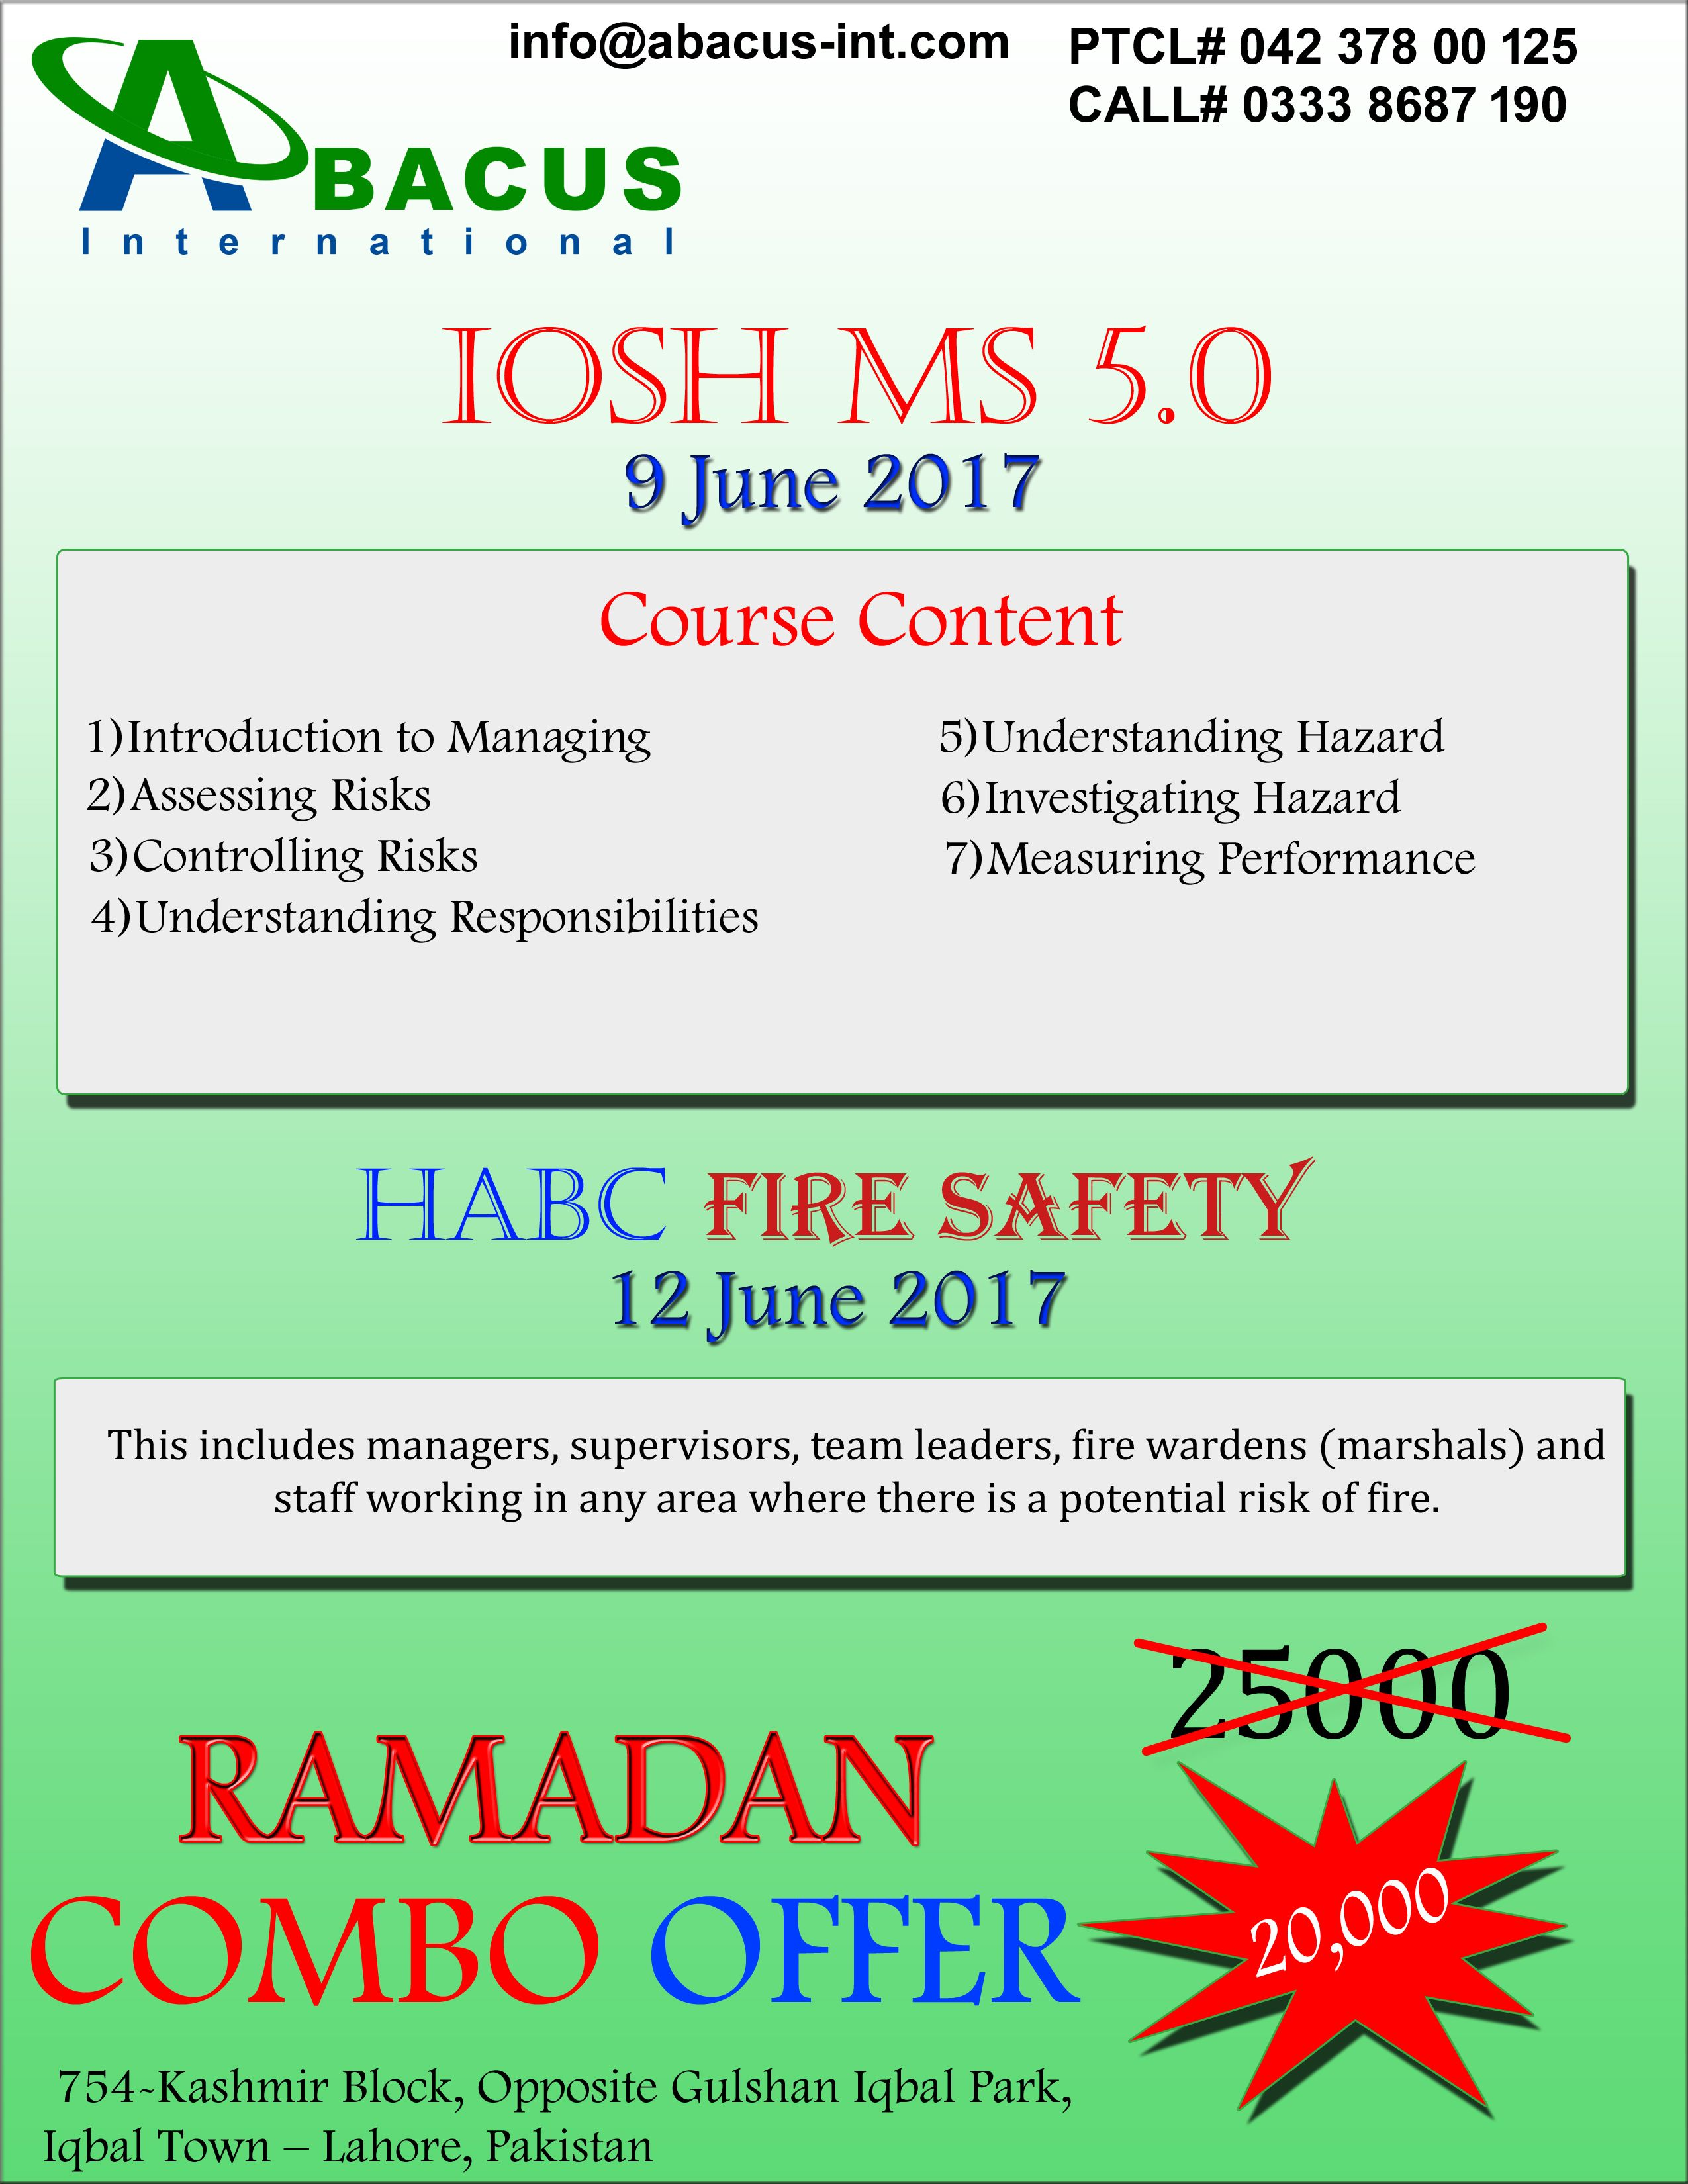 03345277400 IOSH Course in Lahore Pakistan 2019